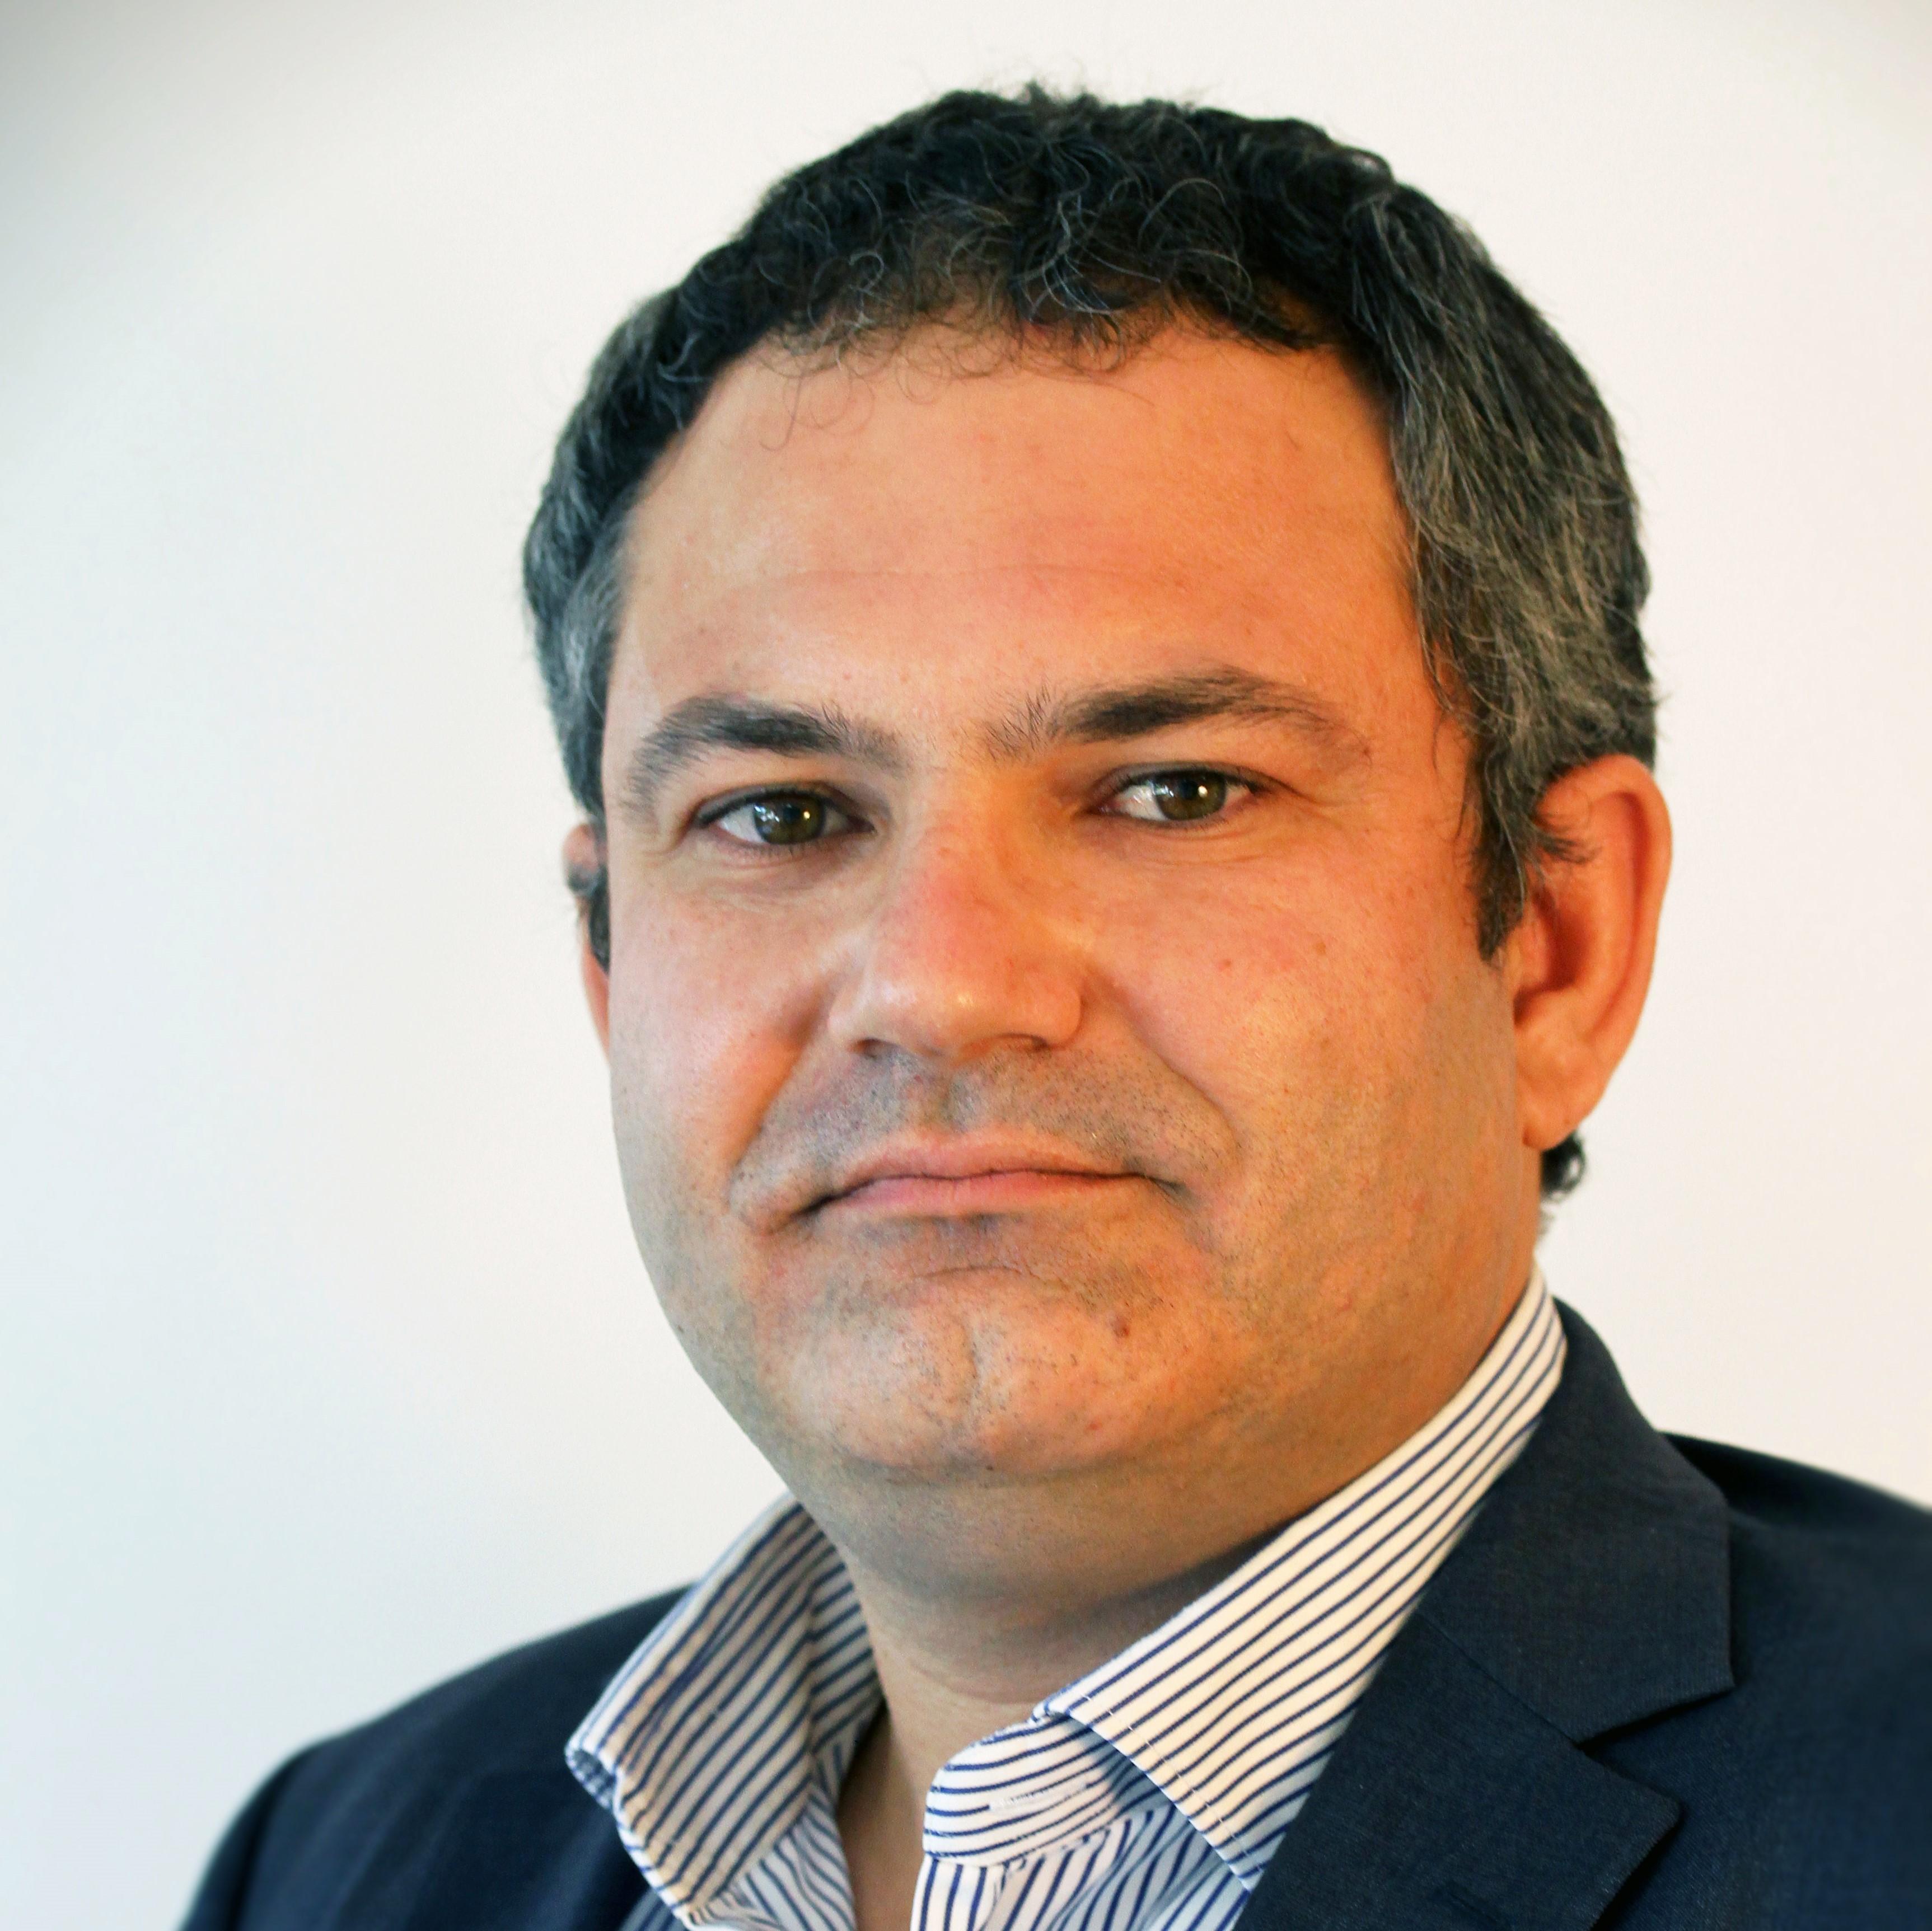 Dr. Serge DA SILVA